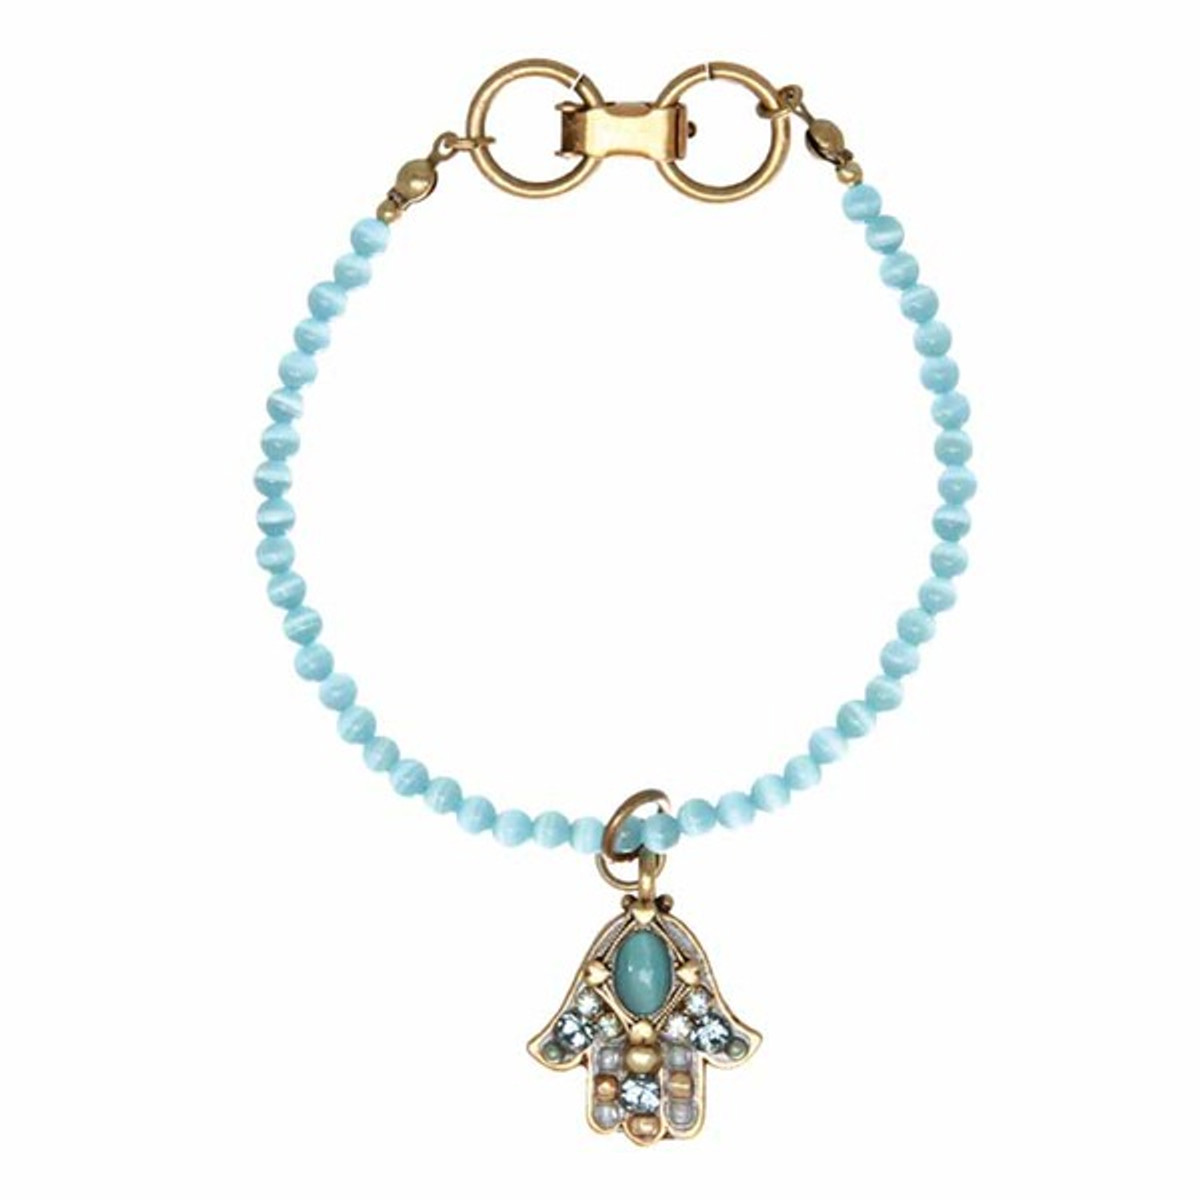 Aqua Hamasa By Michal Golan Jewelry